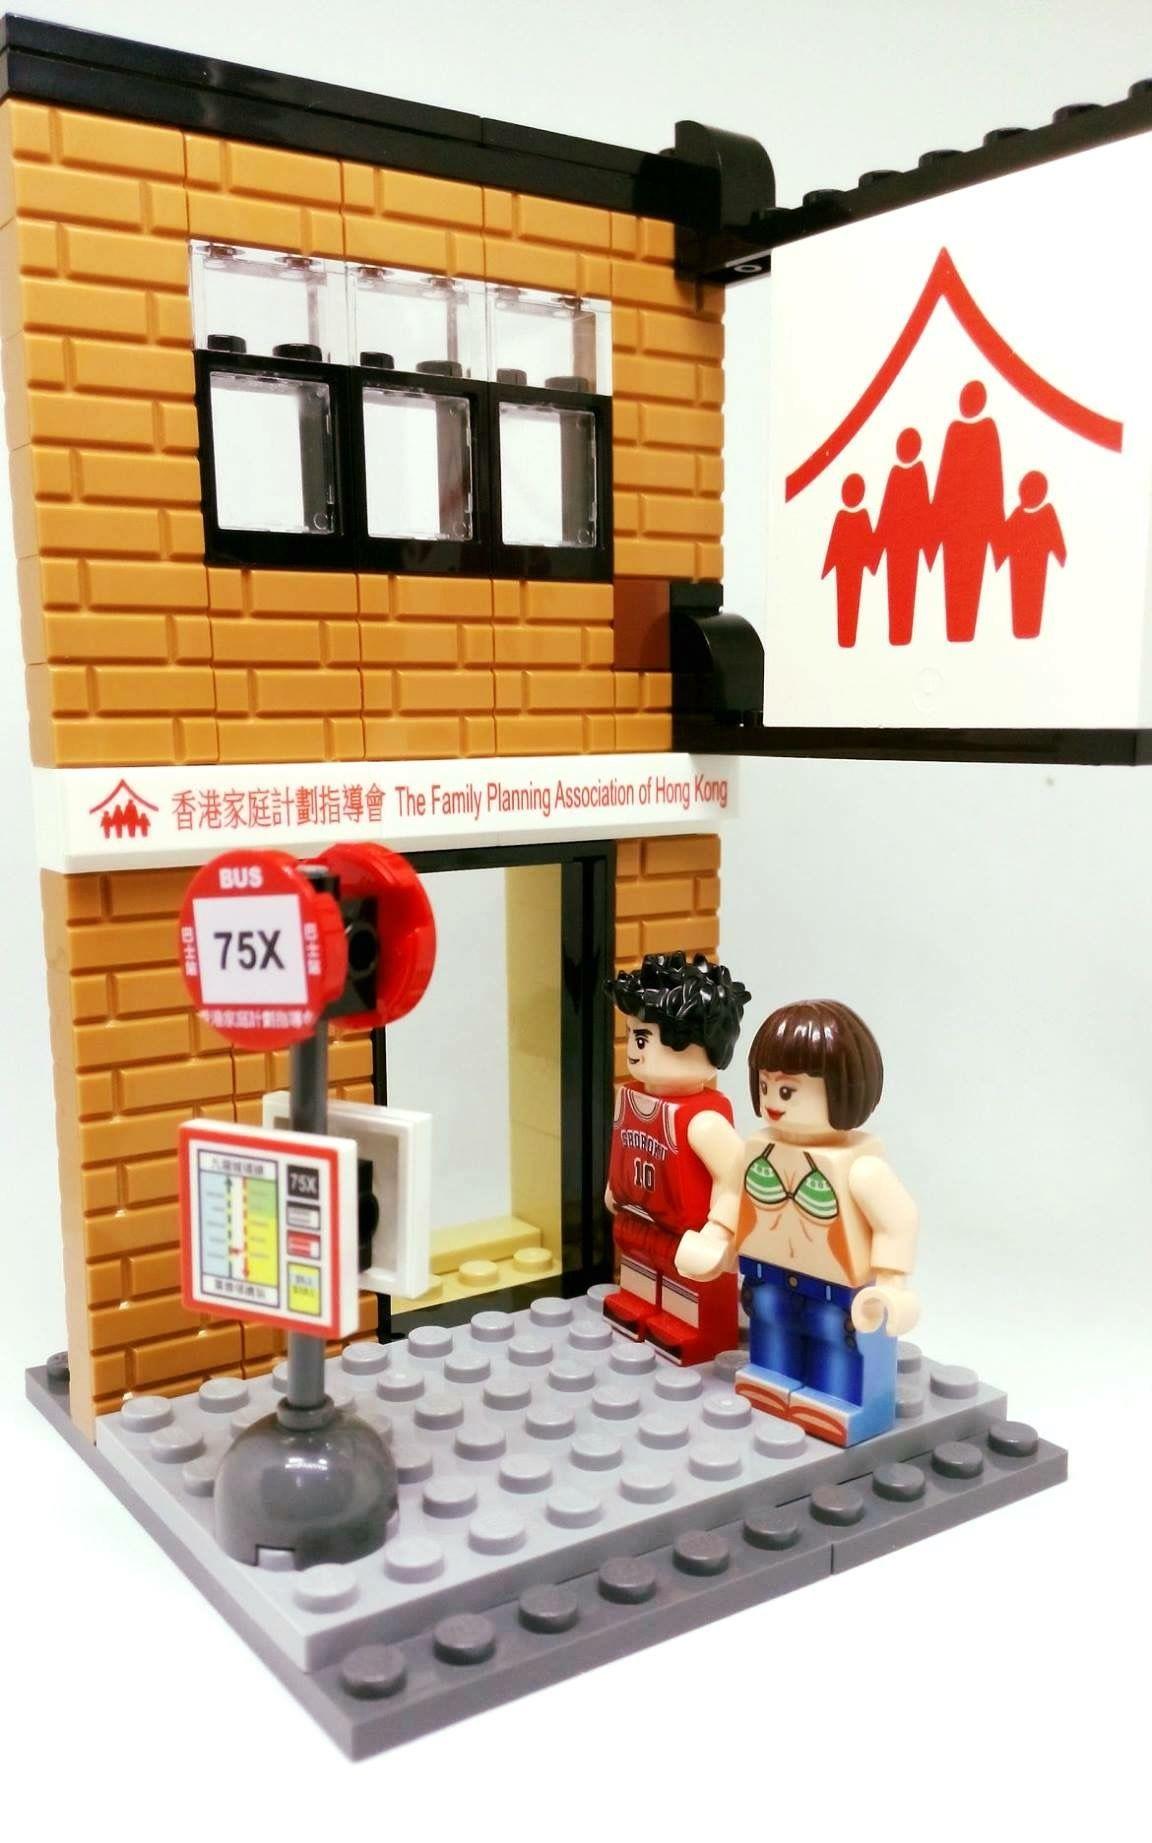 Pin By Tata On Lego Figures Stromtropper Lego Figures Family Planning Lego